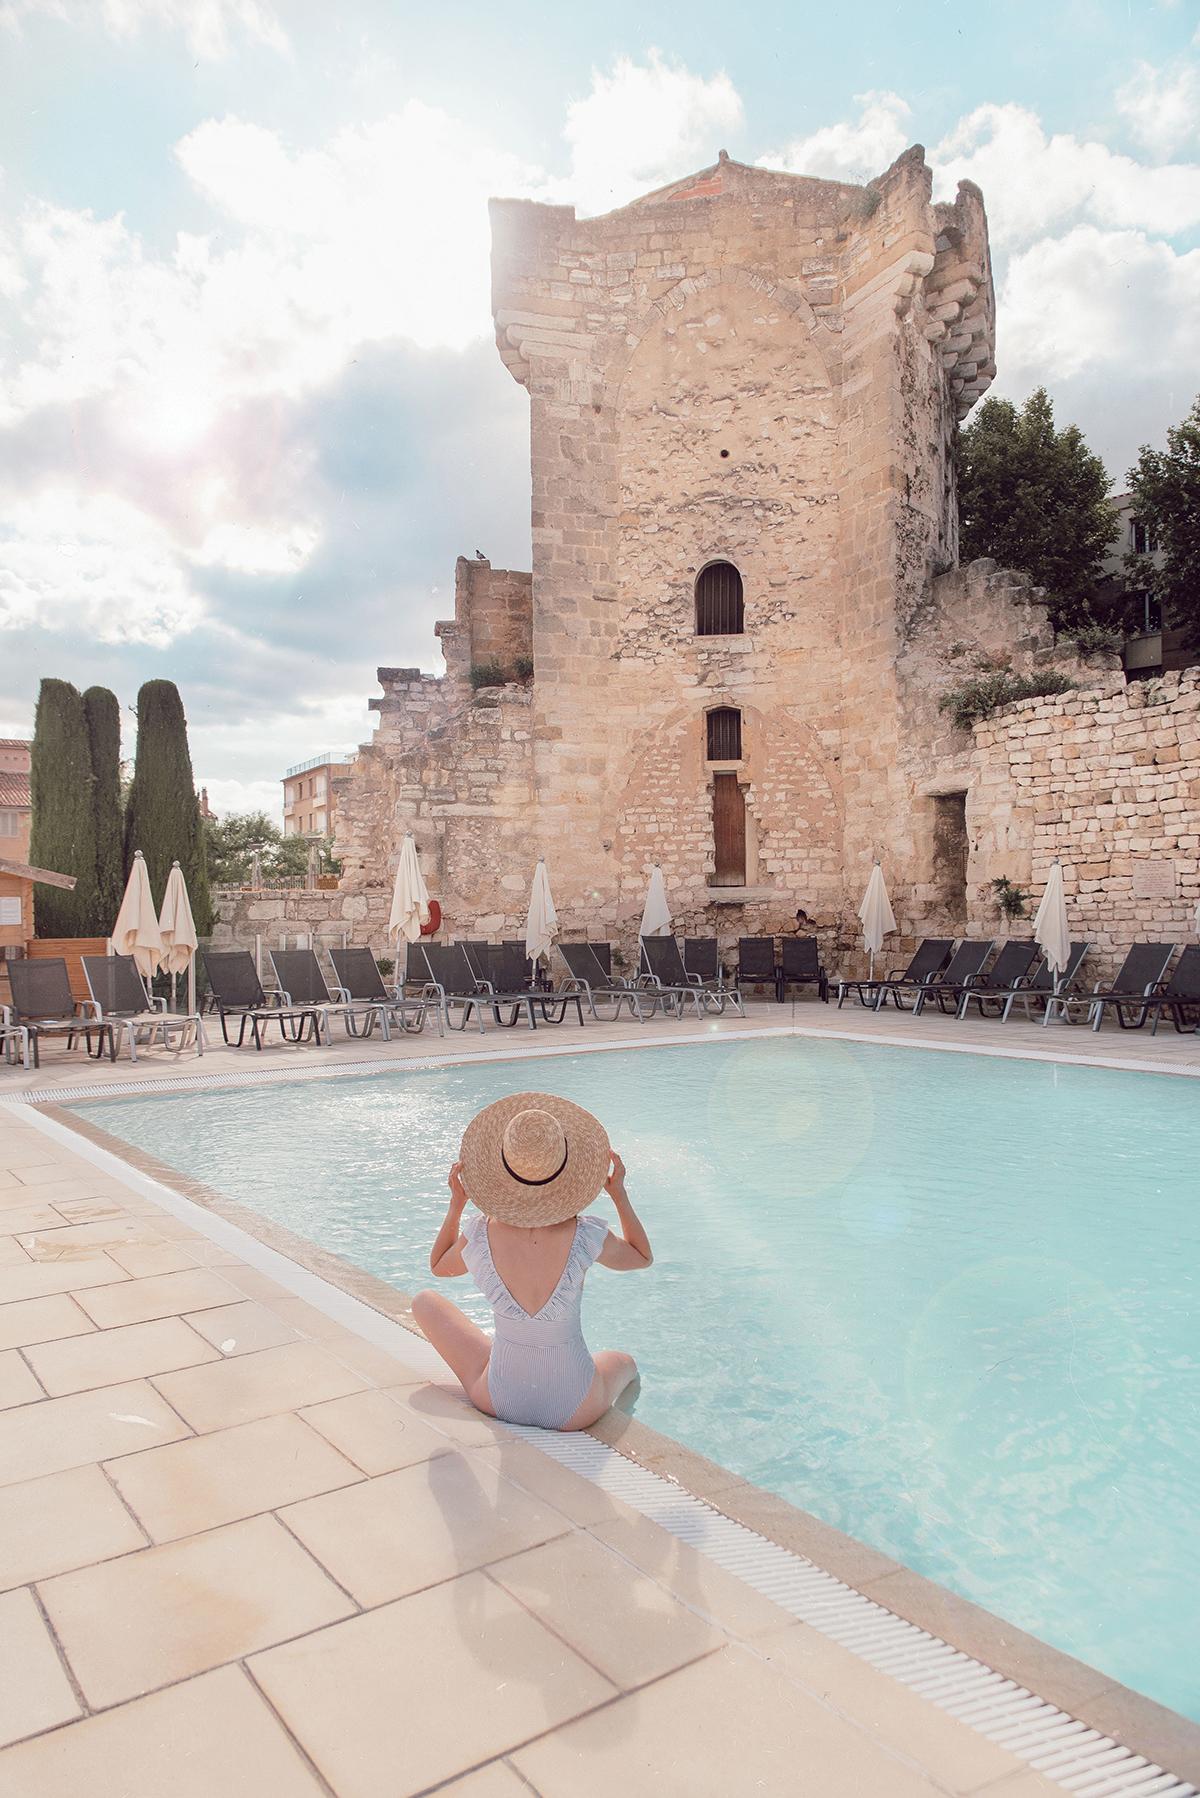 Piscine-Hotel-Aquabella-Aix-Provence-maillot-bain-volants-rayures